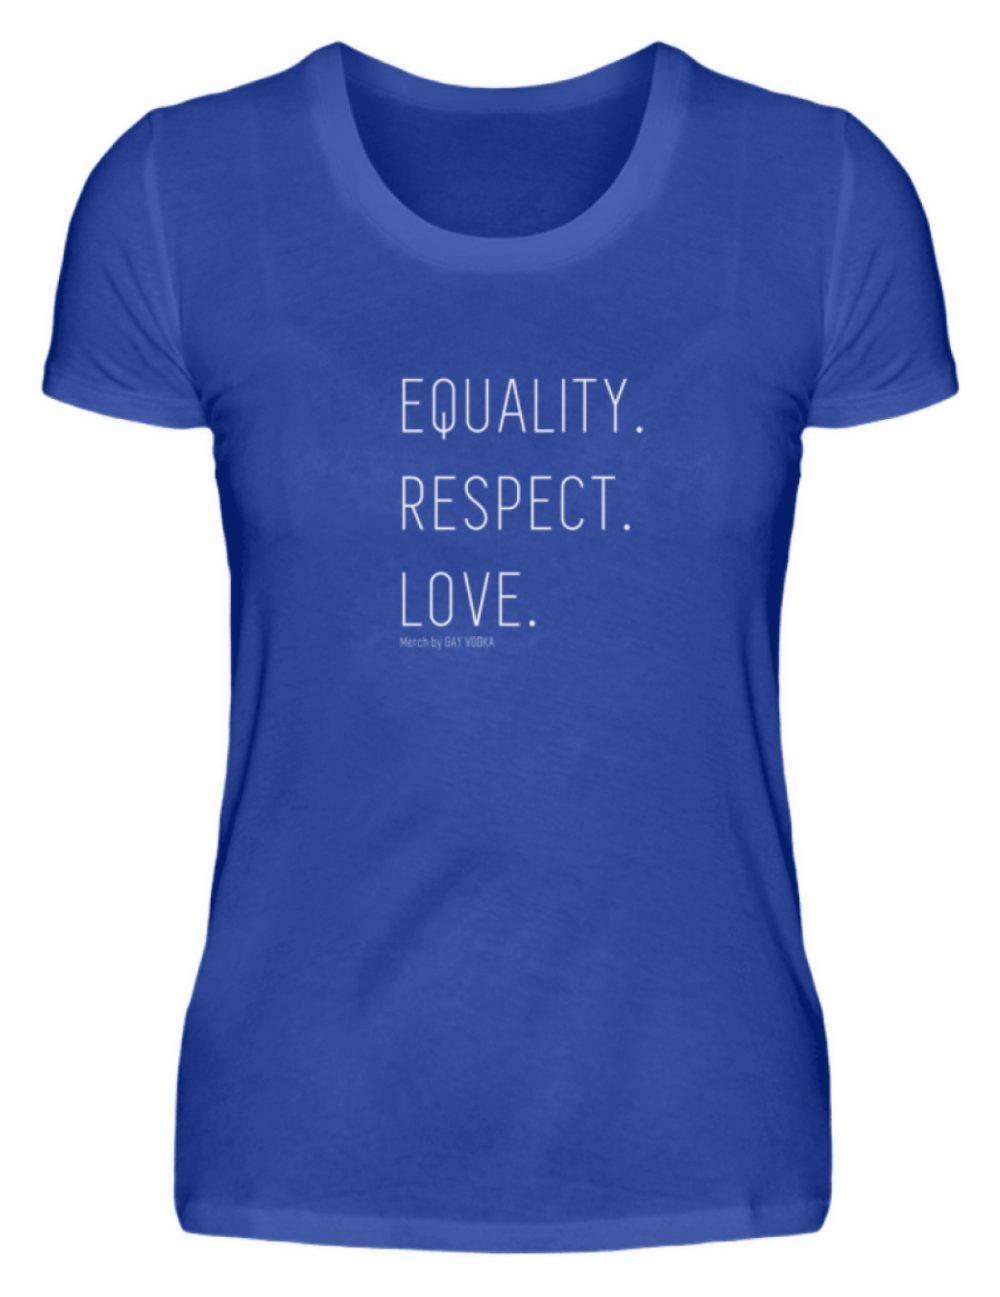 EQUALITY. RESPECT. LOVE. - Damenshirt-2496